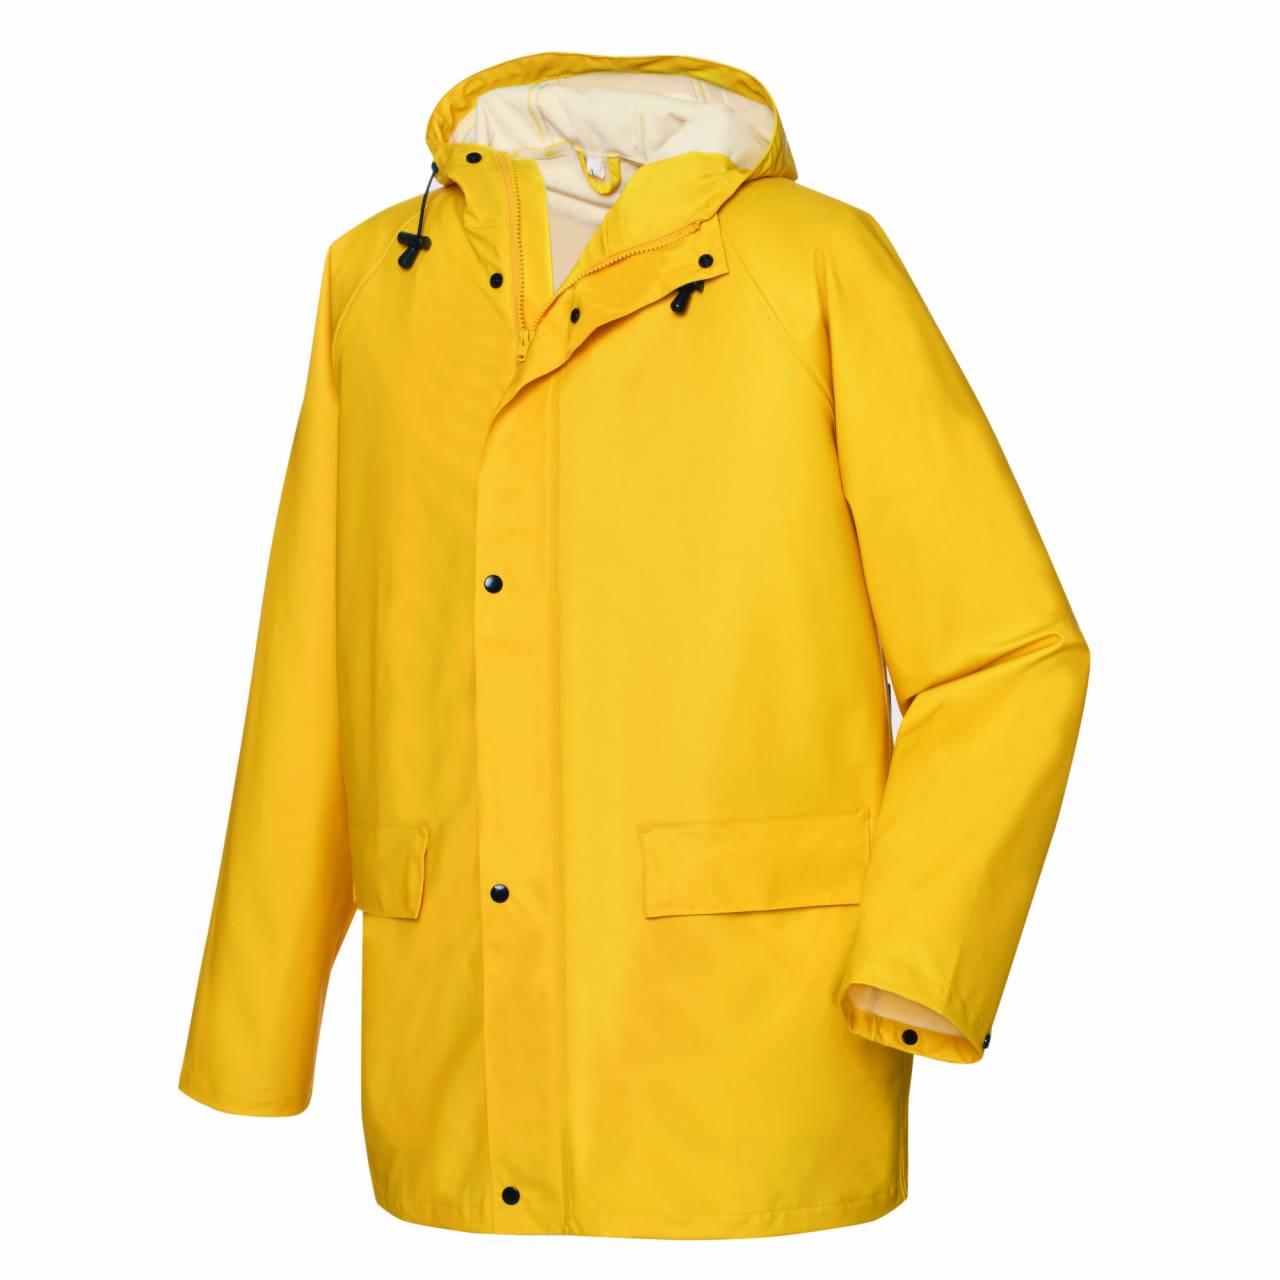 PU-Regenschutz-Jacke gelb, Gr.XXL, mit Kapuze